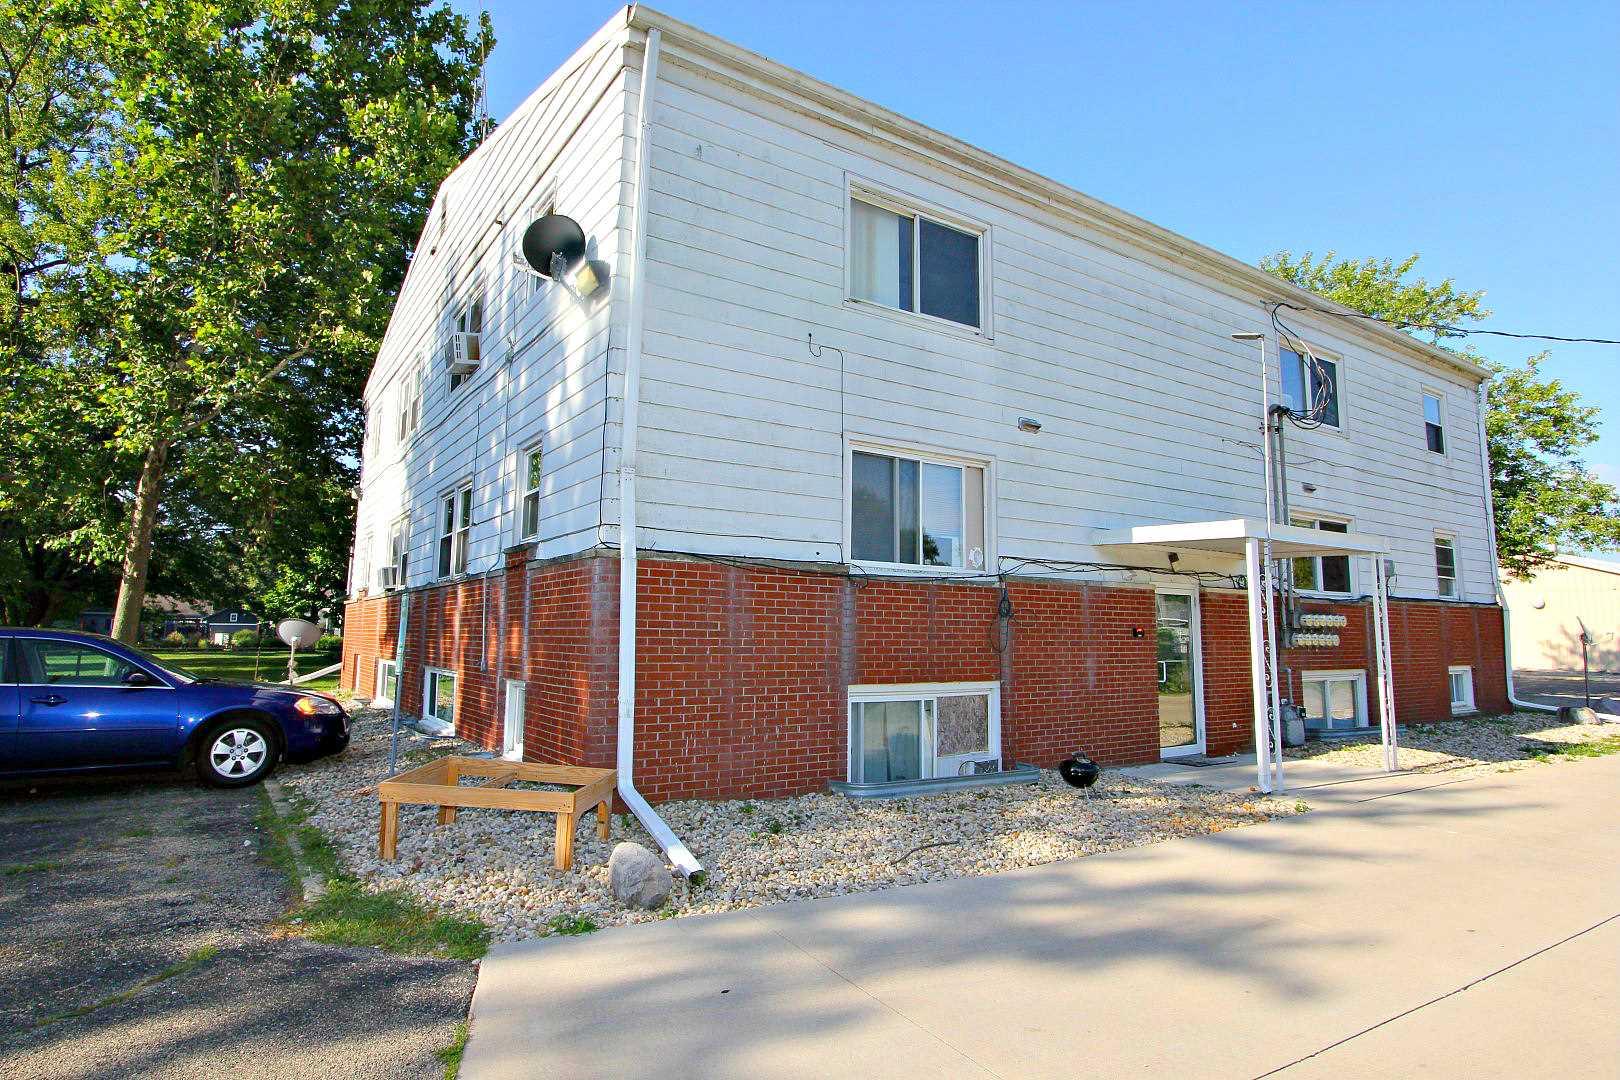 522 N MAIN Property Photo - Hanna City, IL real estate listing